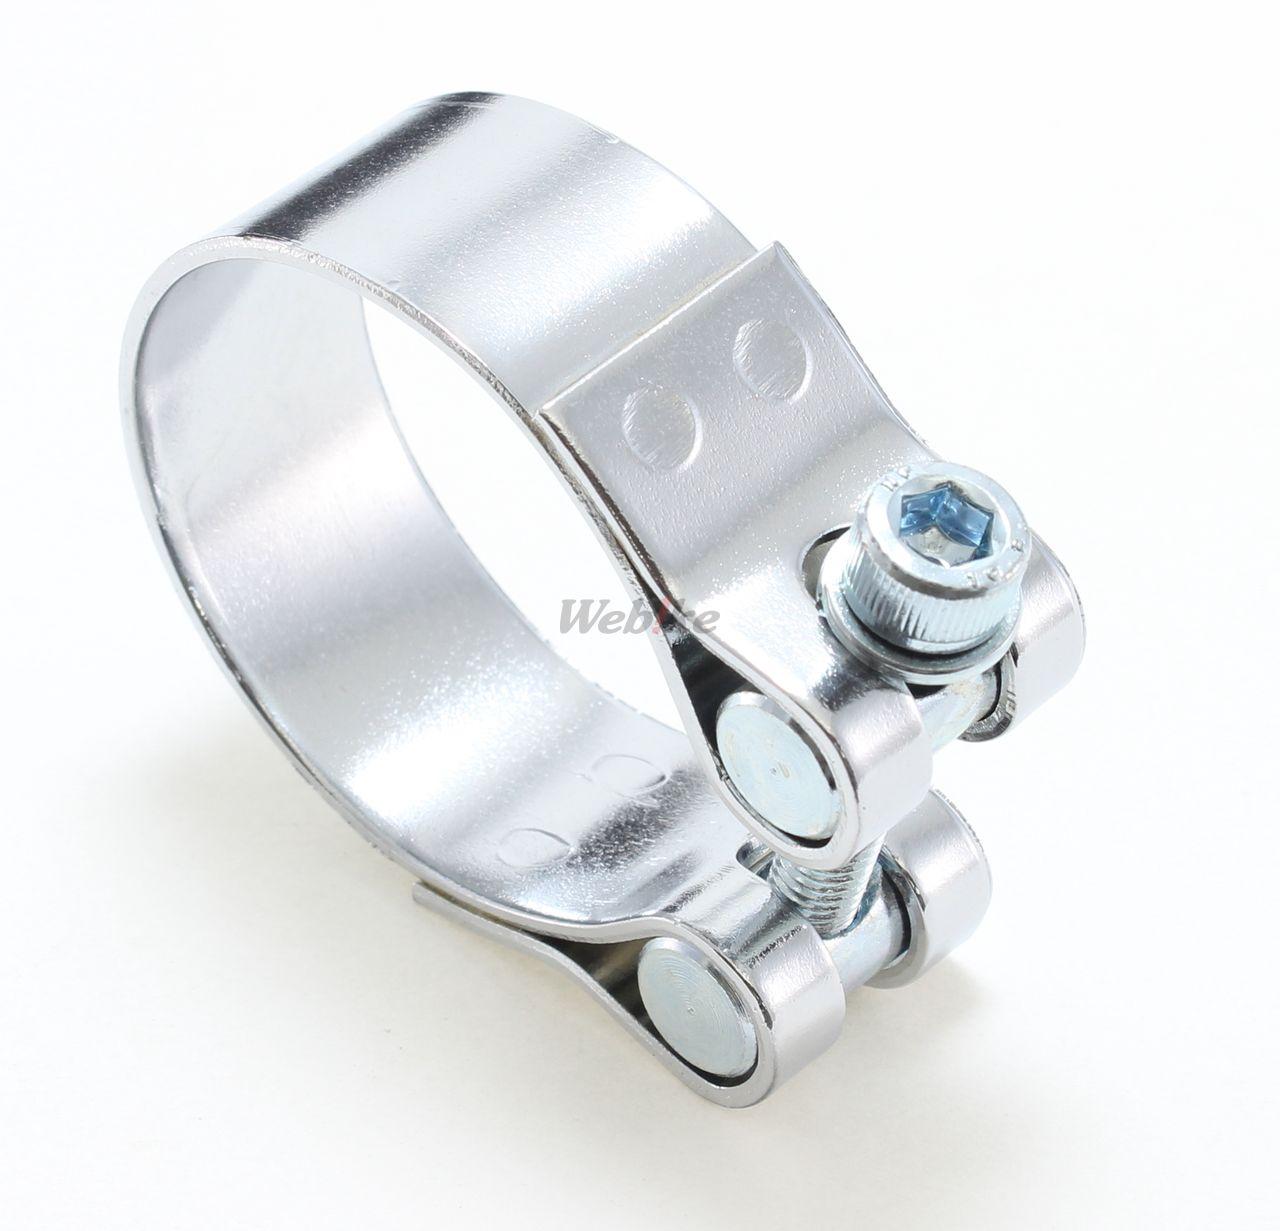 【POSH】排氣管用吊環 - 「Webike-摩托百貨」